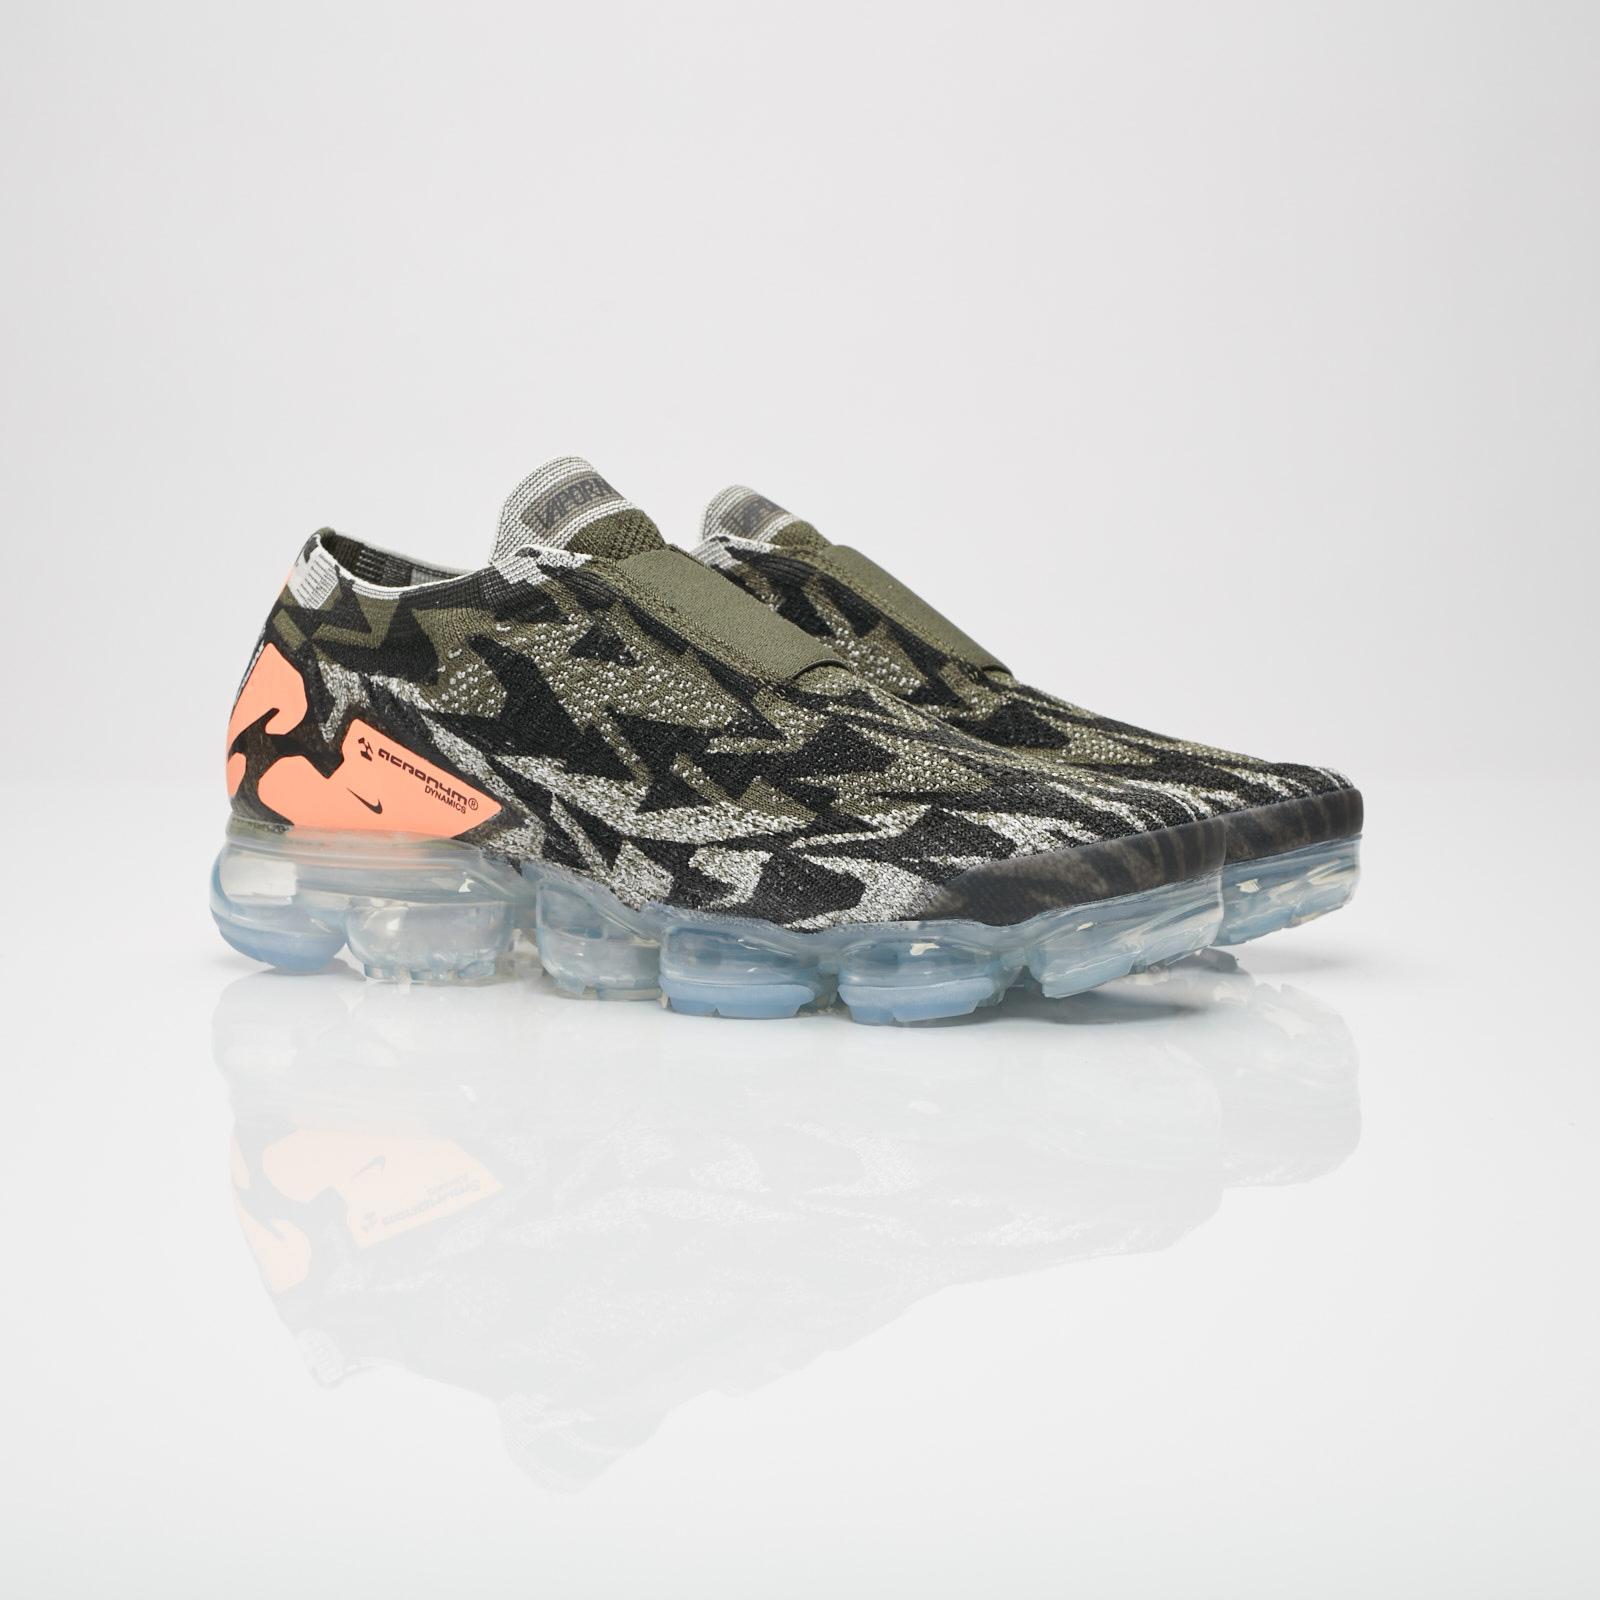 e0350017d49f0 Nike Air Vapormax FK Moc 2   Acronym - Aq0996-102 - Sneakersnstuff ...